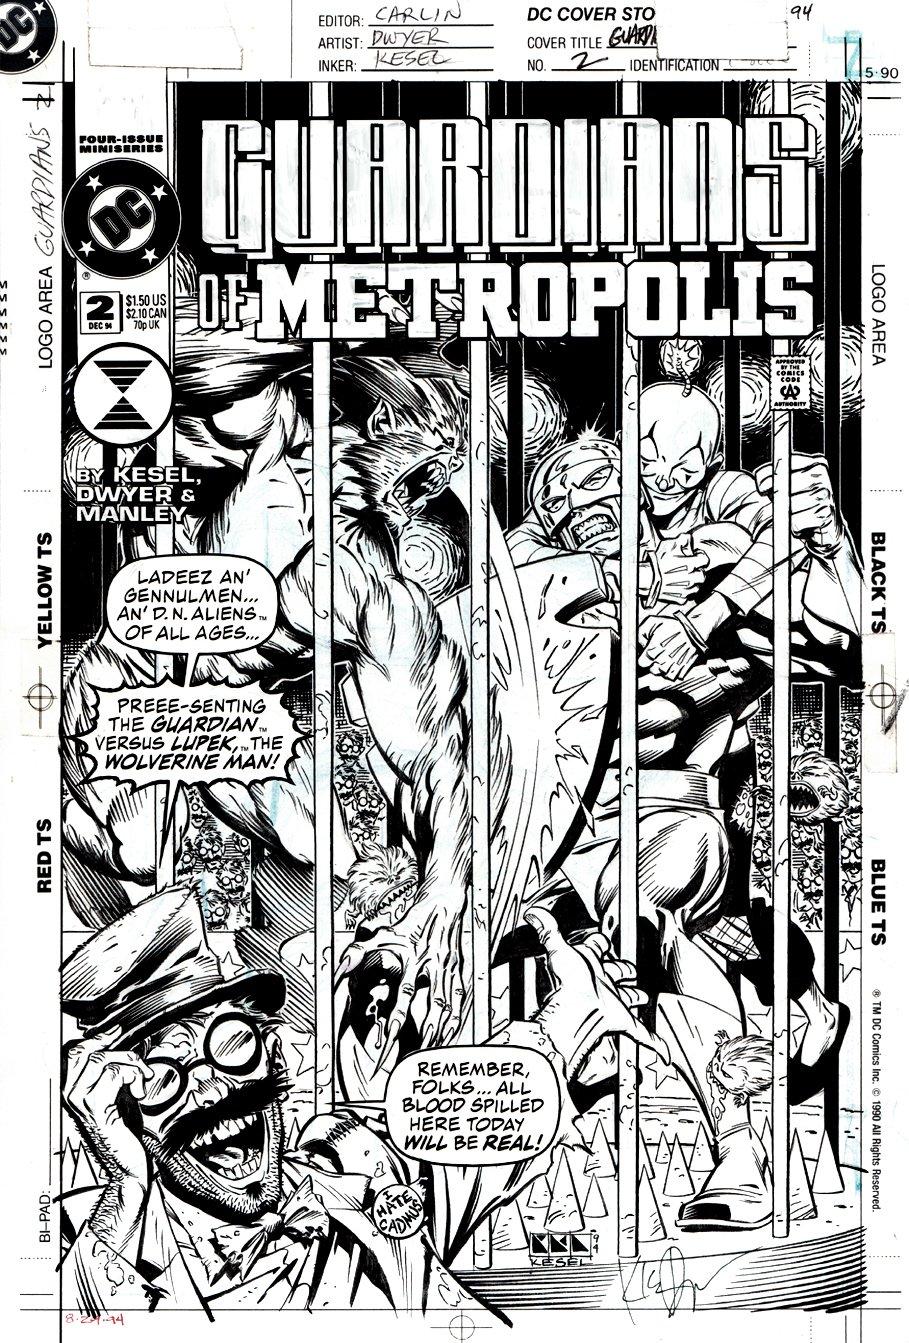 Guardians of Metropolis #2 Cover (THE GUARDIAN VS WOLVERINE MAN!) 1994